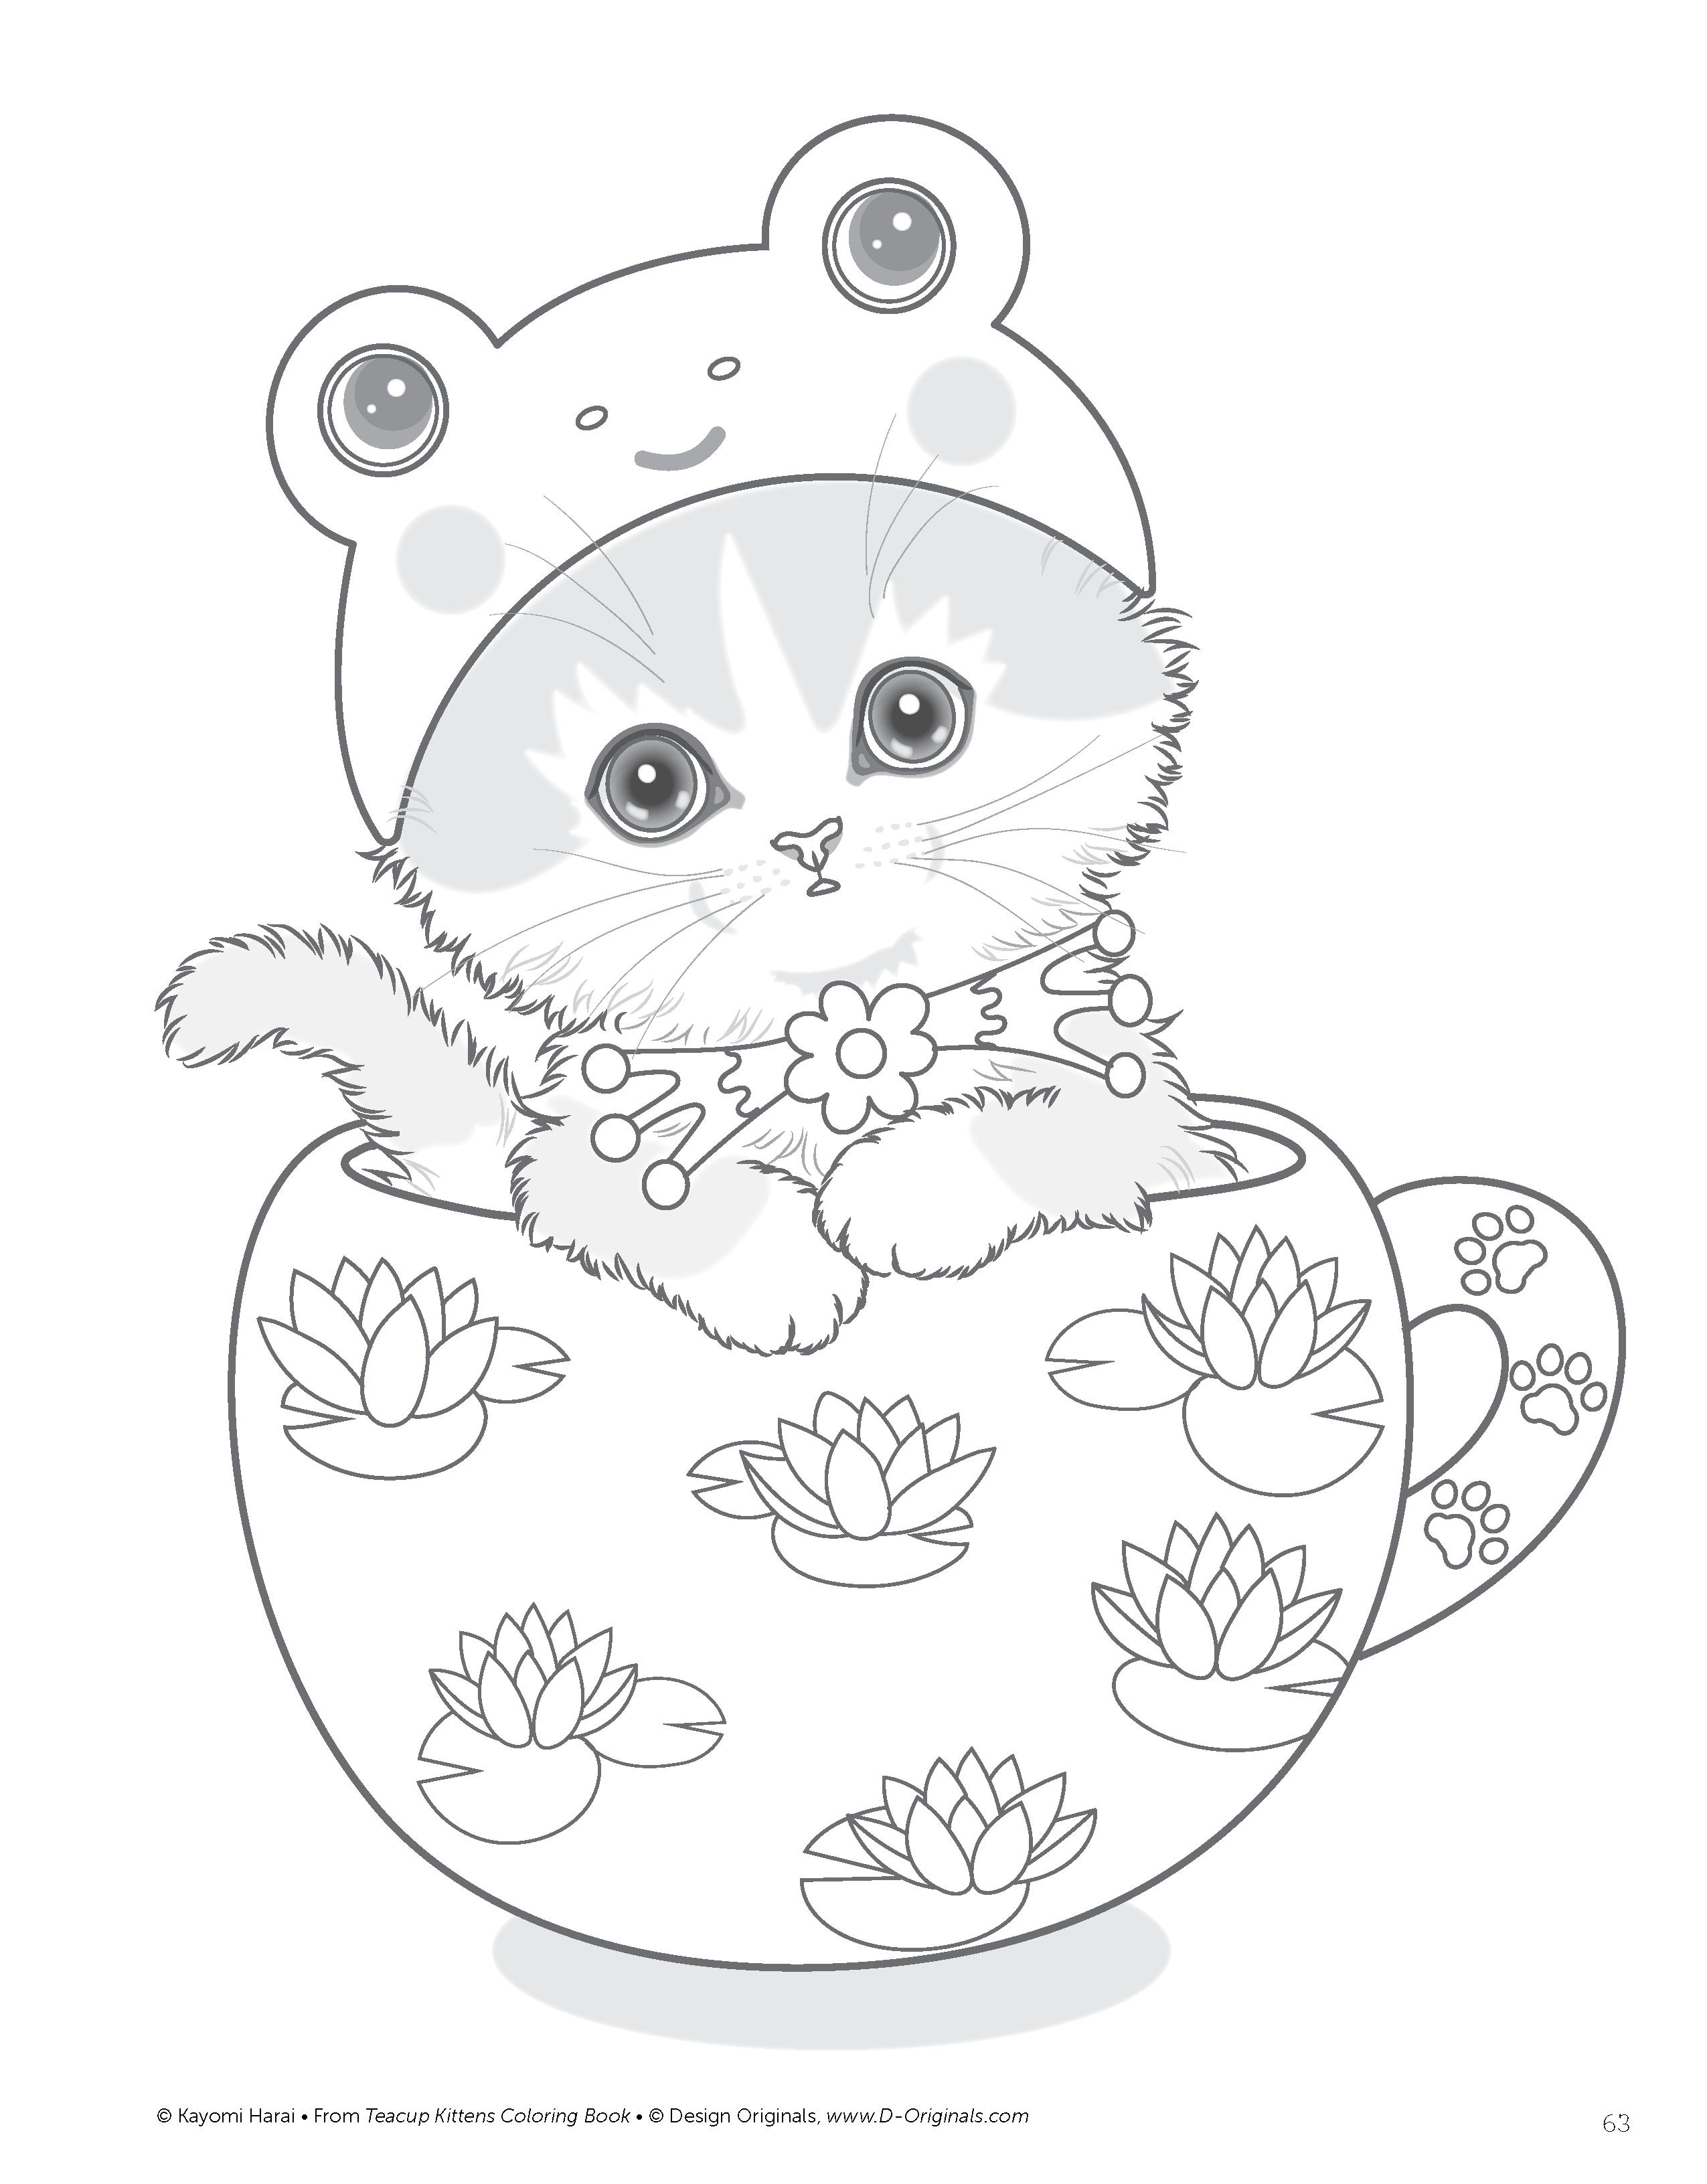 Teacup Kittens Coloring Book Design Originals Kayomi